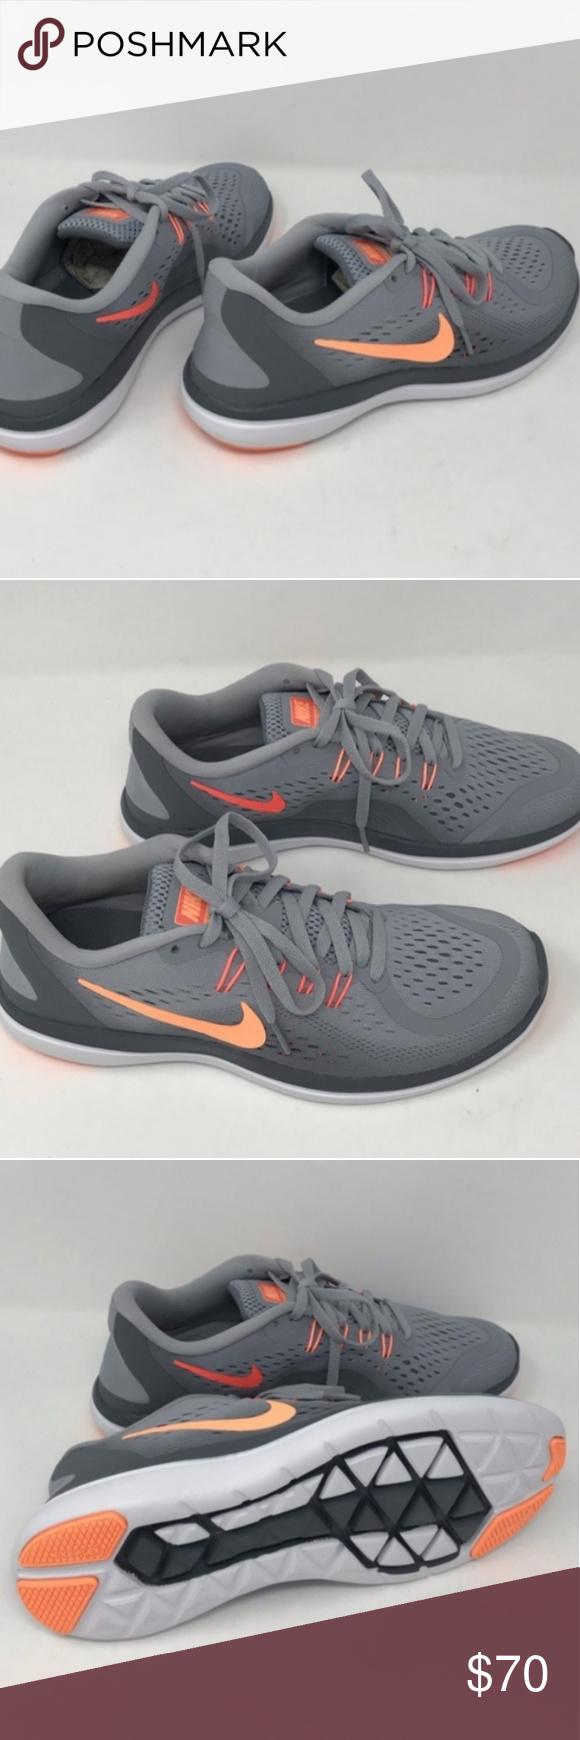 Grey nike running shoes, Sneakers